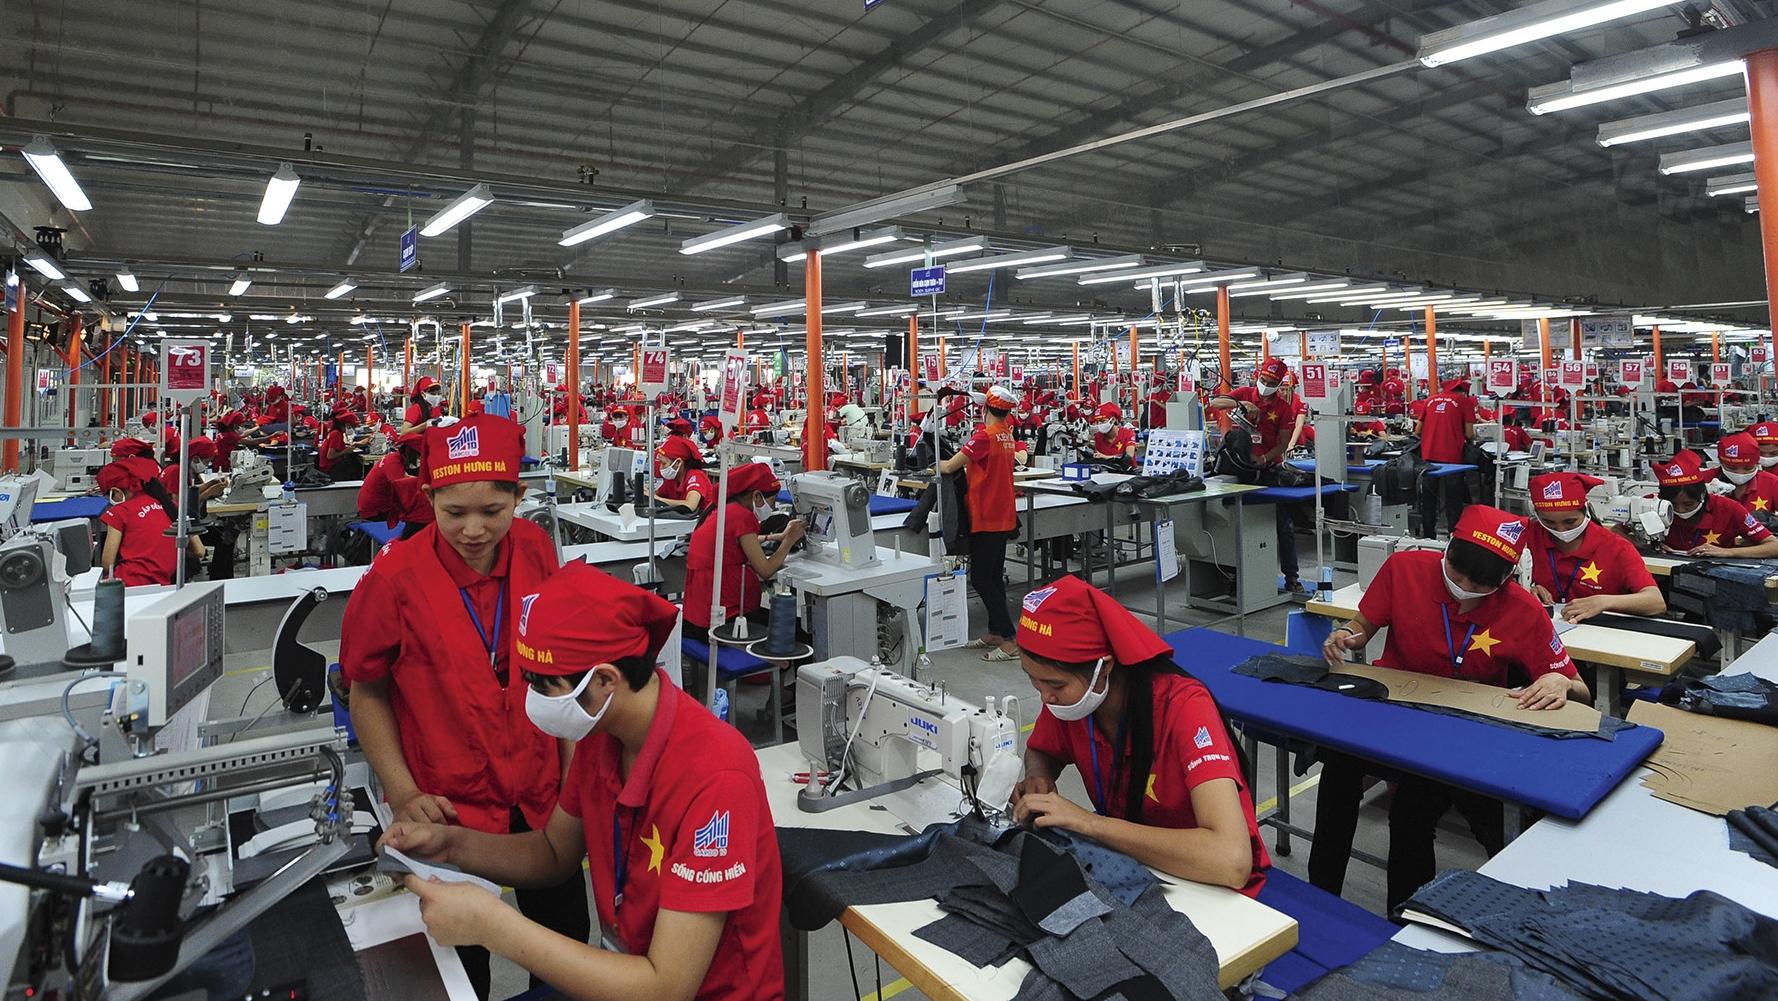 doanh nghiep det may tiep tuc gap kho